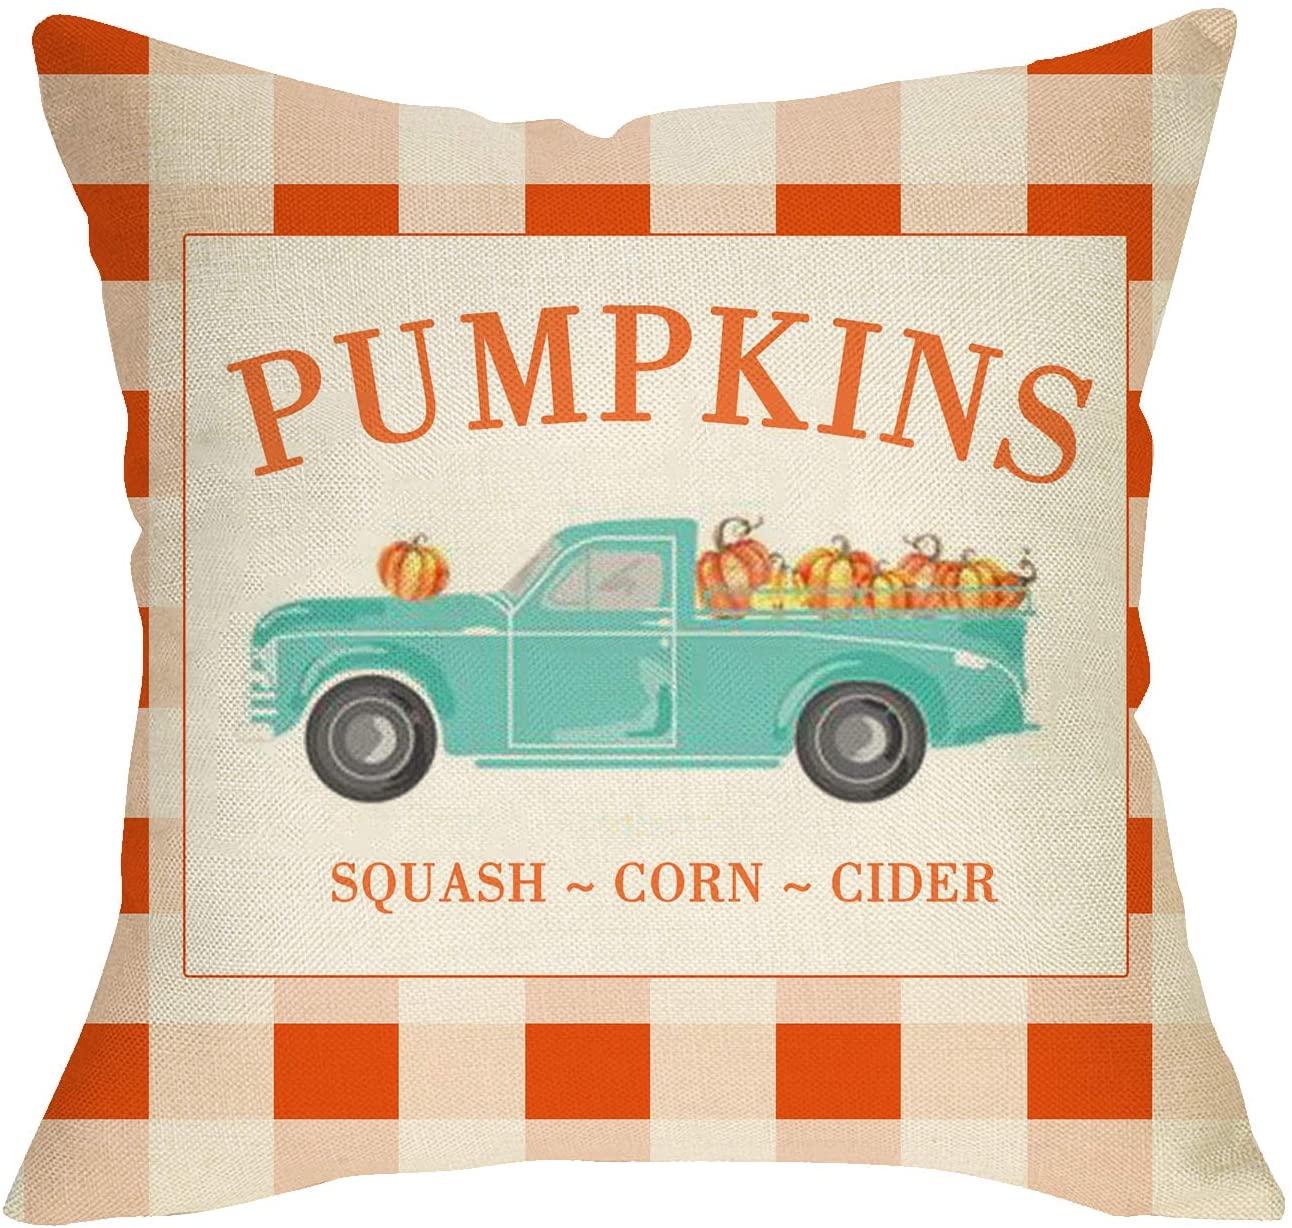 Fbcoo Pumpkins Truck Throw Pillow Cover Farmhouse Decorative Cushion Case Buffalo Plaid Check Autumn Home Decorations Fall Square Pillowcase Thanksgiving Decor for Sofa Couch 18 x 18 Inch Cotton Linen